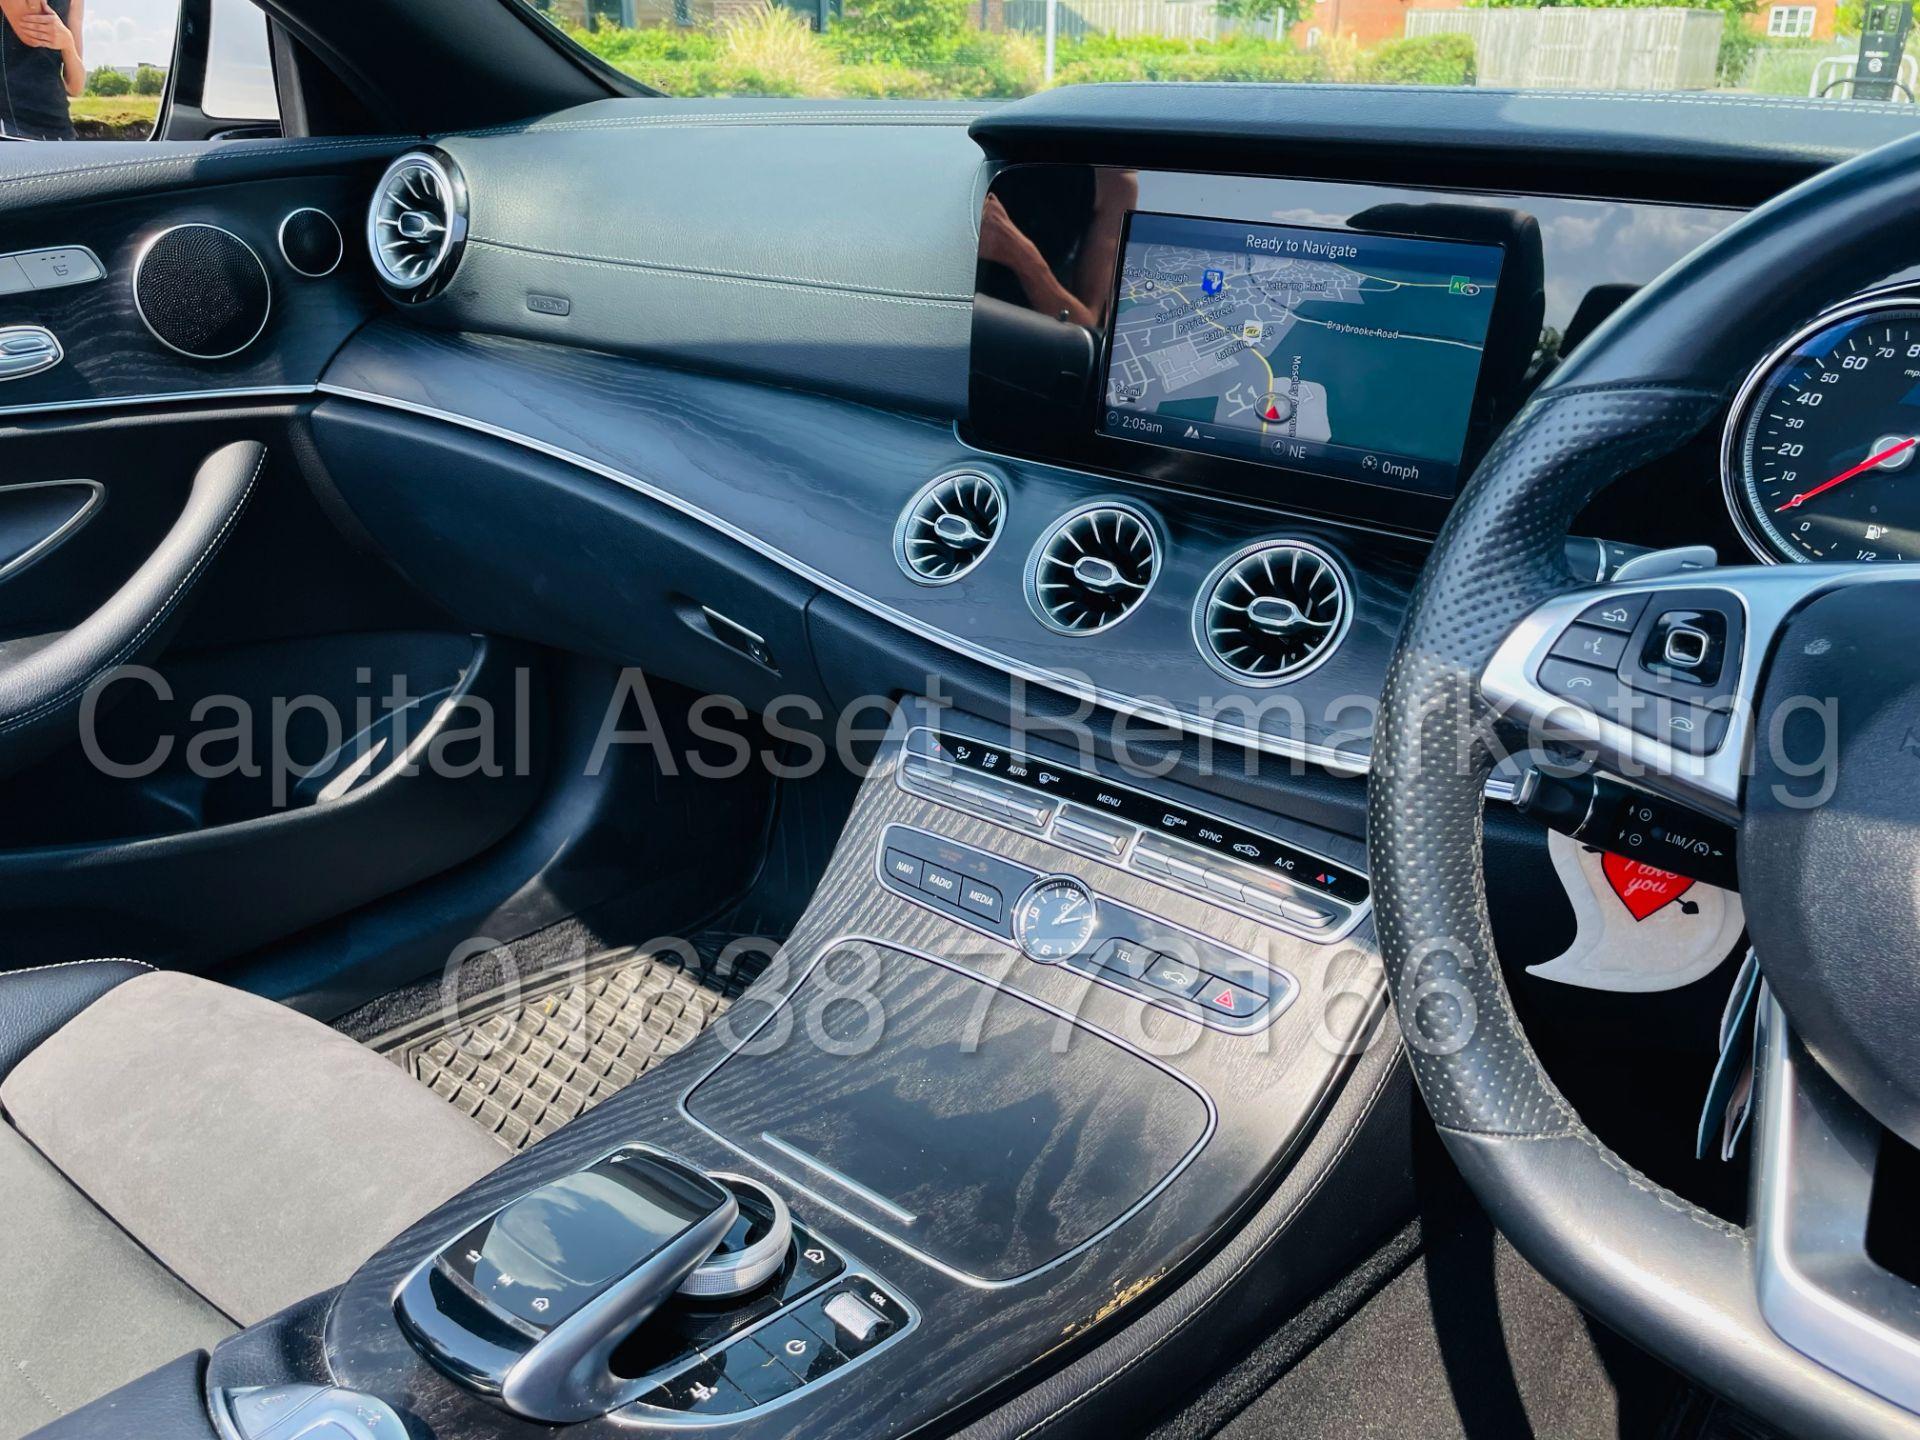 MERCEDES-BENZ E220d *AMG LINE PREMIUM - CABRIOLET* (2018 - EURO 6) '9G AUTO - LEATHER - SAT NAV' - Image 53 of 63